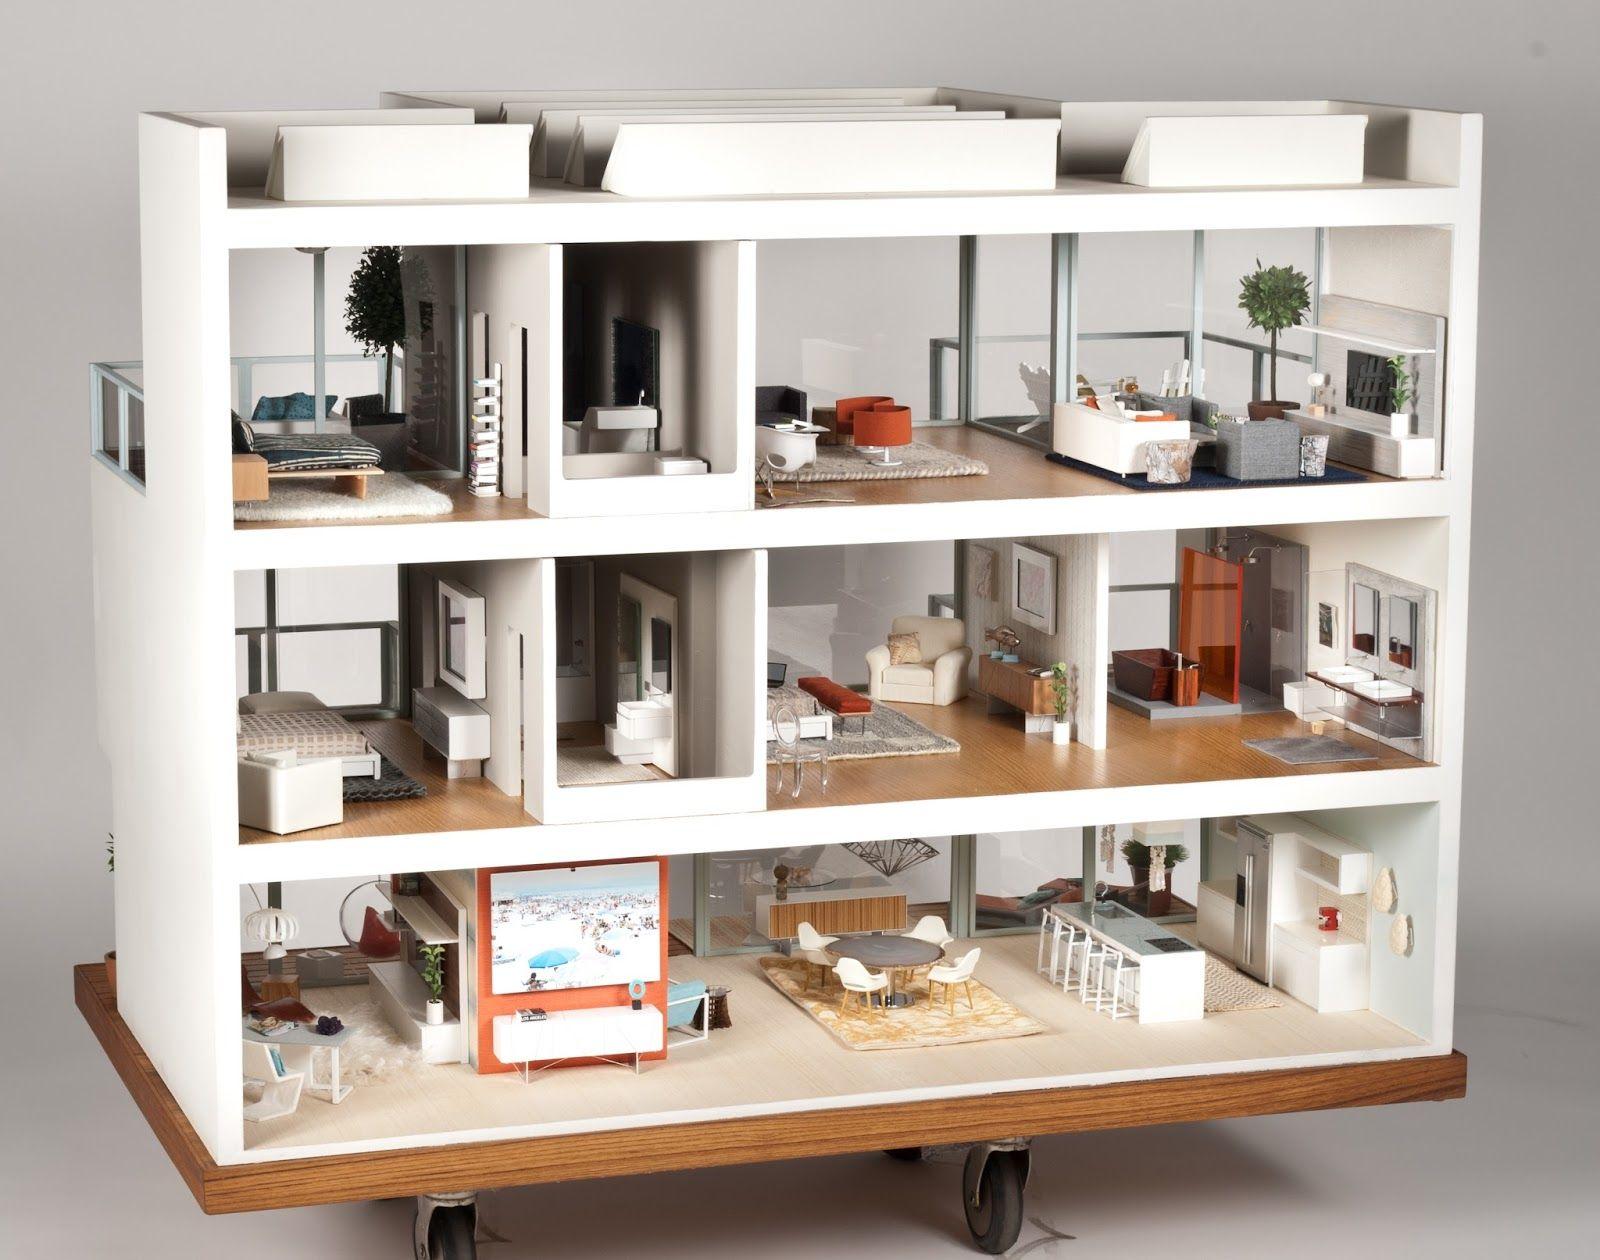 Modern house 1 by natasha baradaran and waldo fernandez